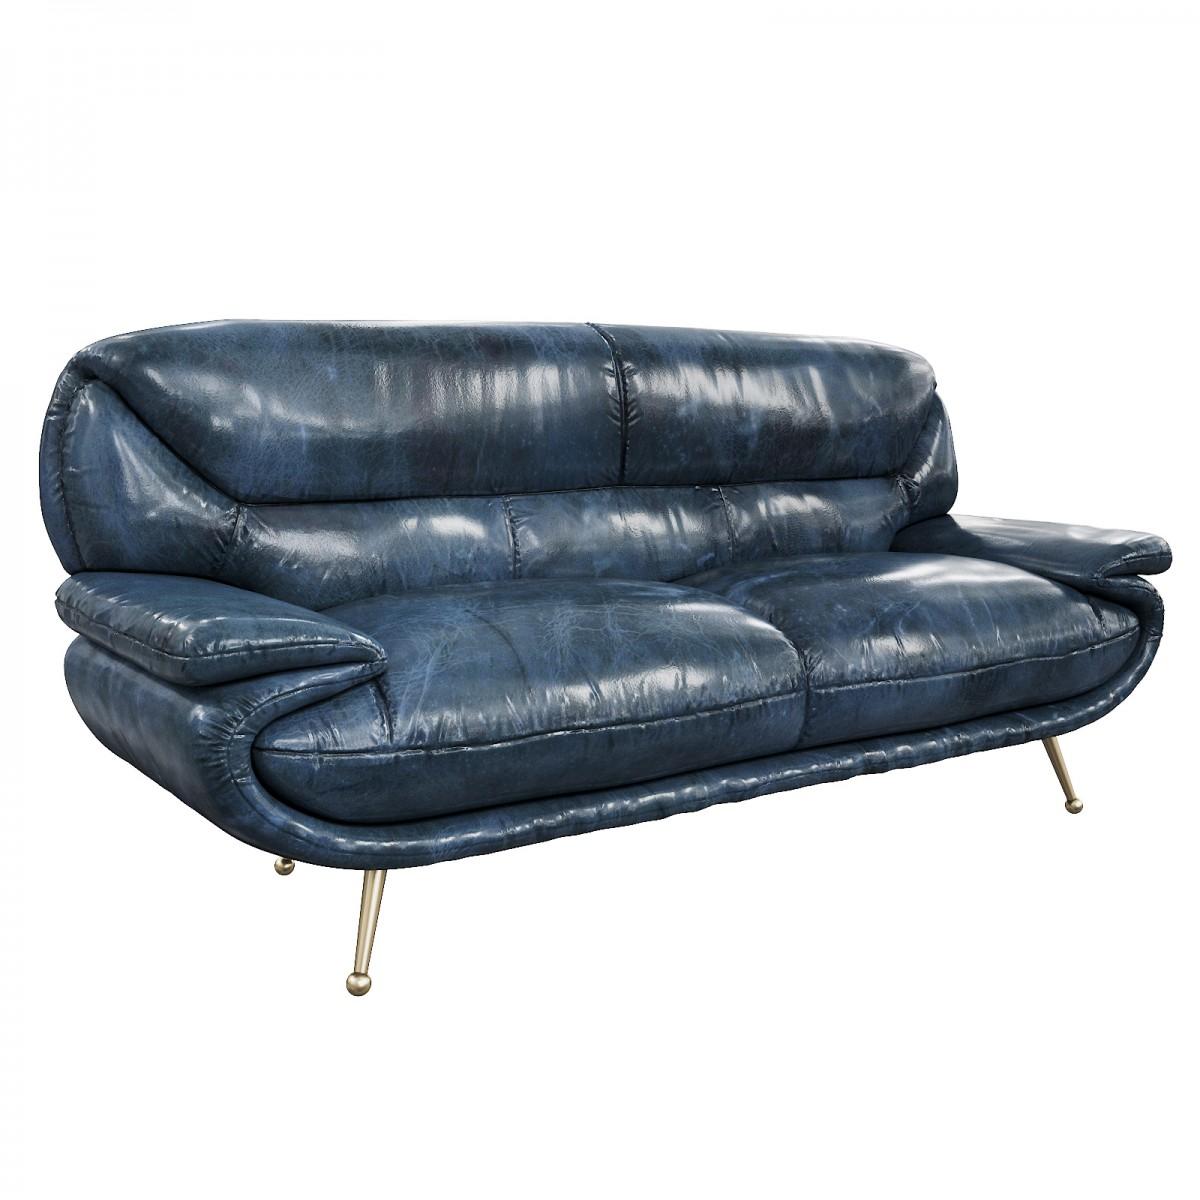 American Eagle Furniture Arcadia: Arcadia Bespoke Vintage Sofa